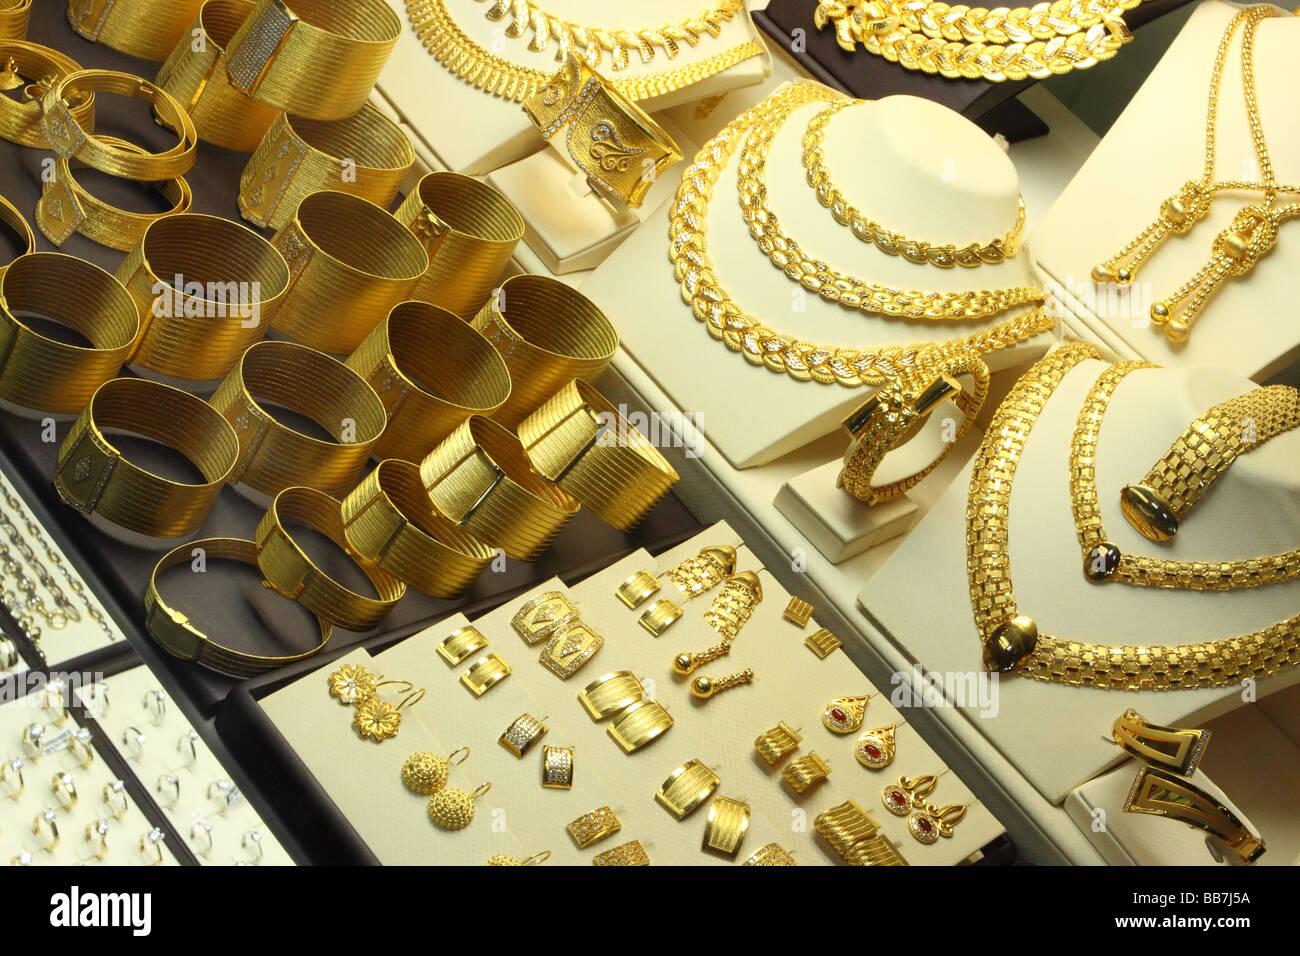 Goldschmuck Stockfotos  Goldschmuck Bilder  Alamy